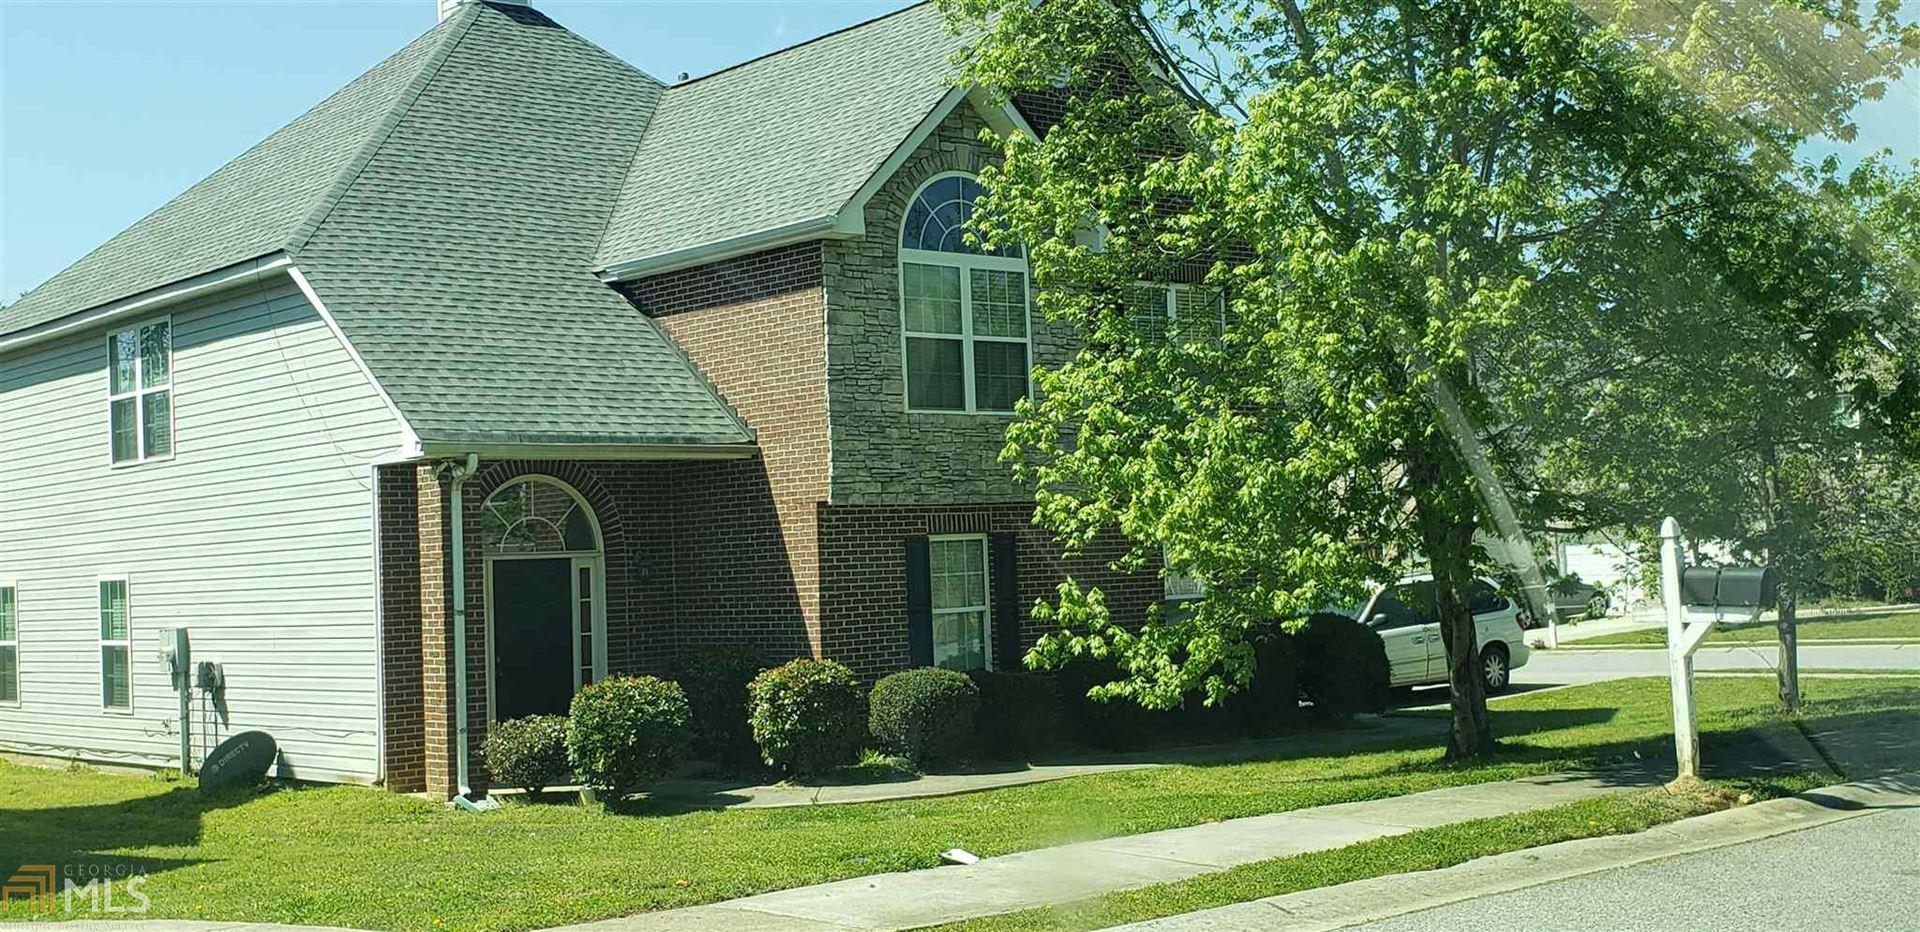 11599 Flemming Cove Dr, Hampton, GA 30228 - #: 8957986